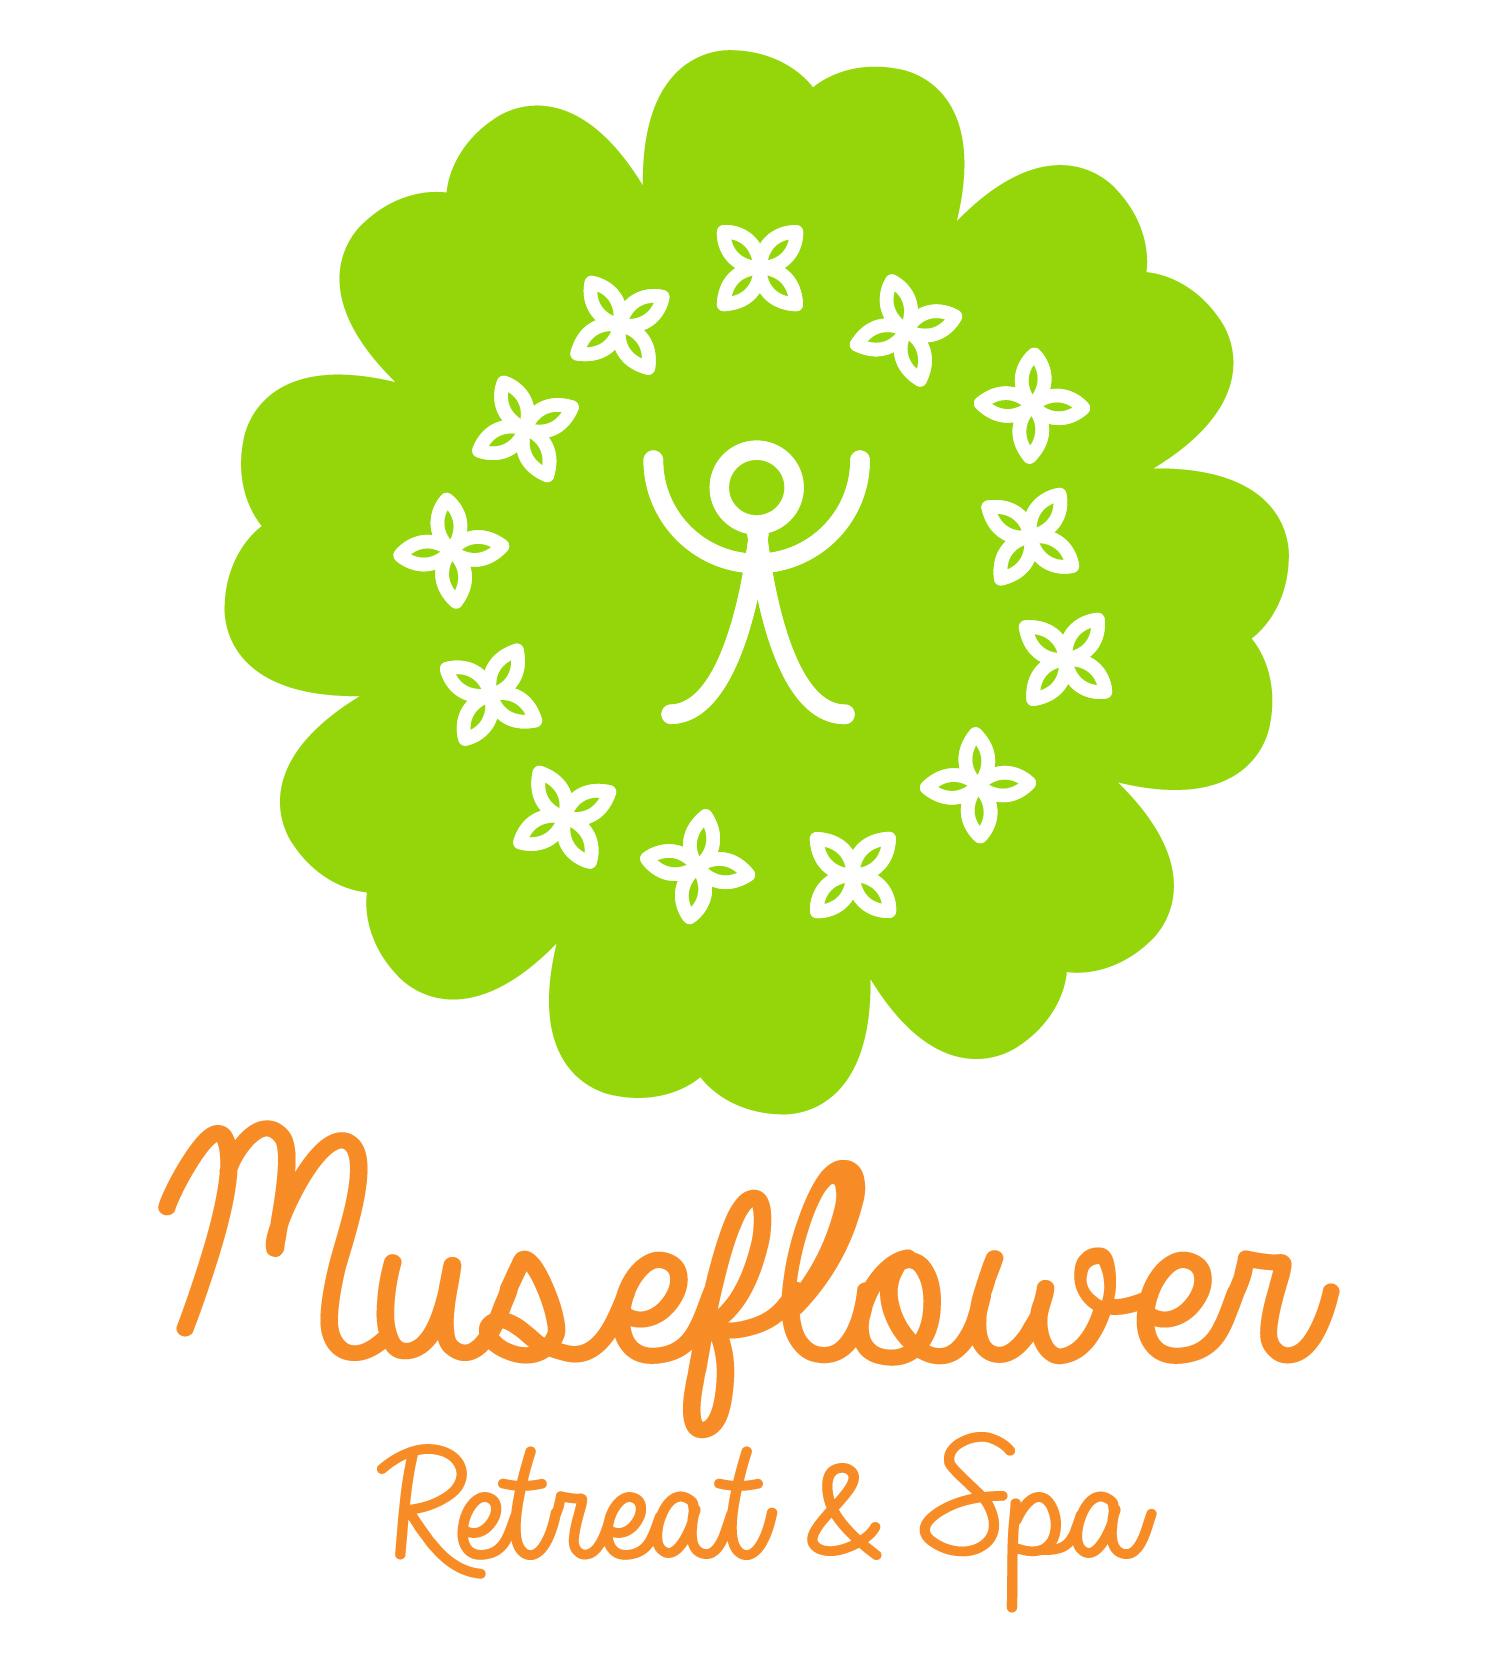 museflower retreat and spa logo